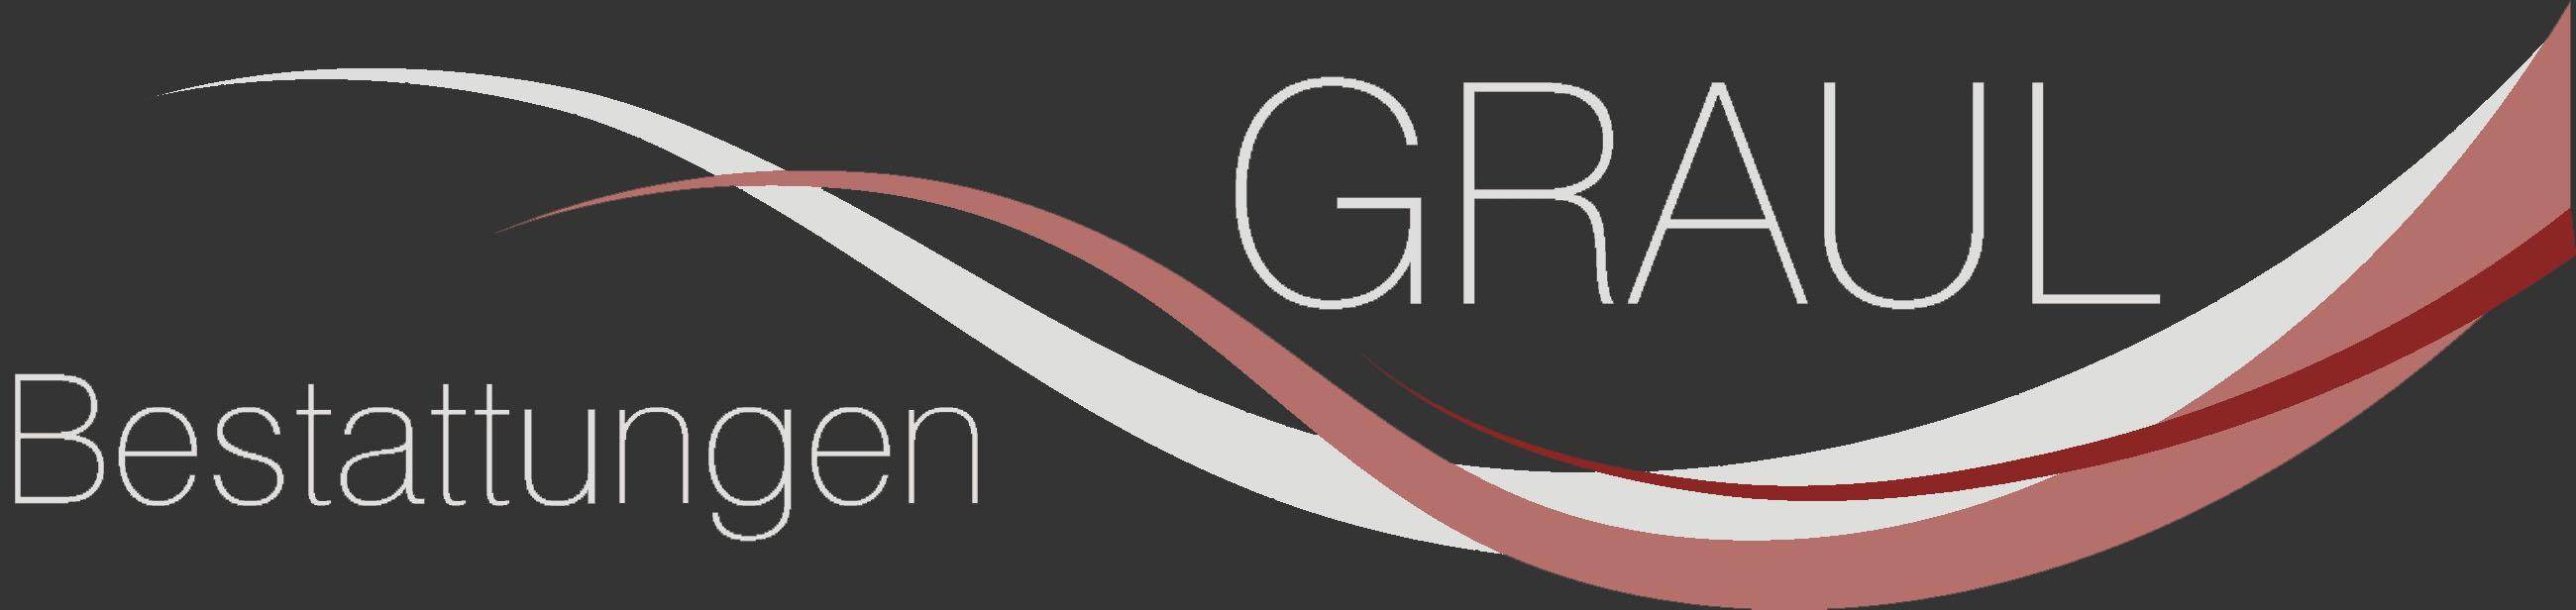 Bestattungen Graul